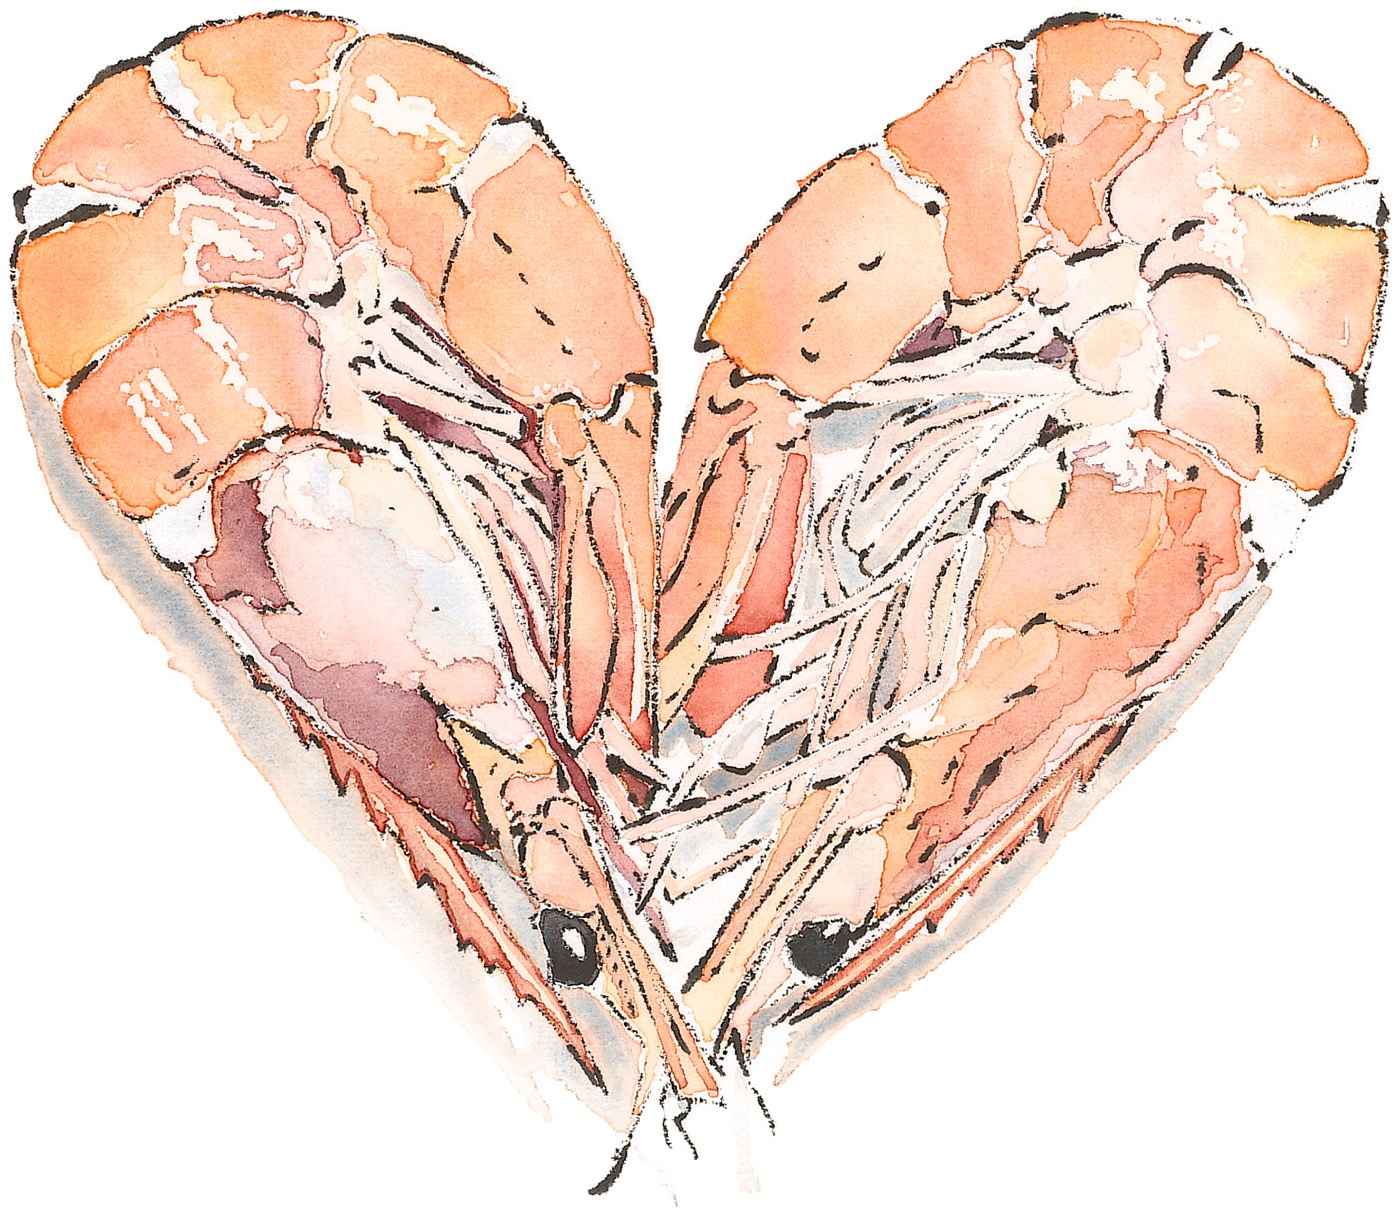 Prawn Heart - Watercolour & Blotted Line